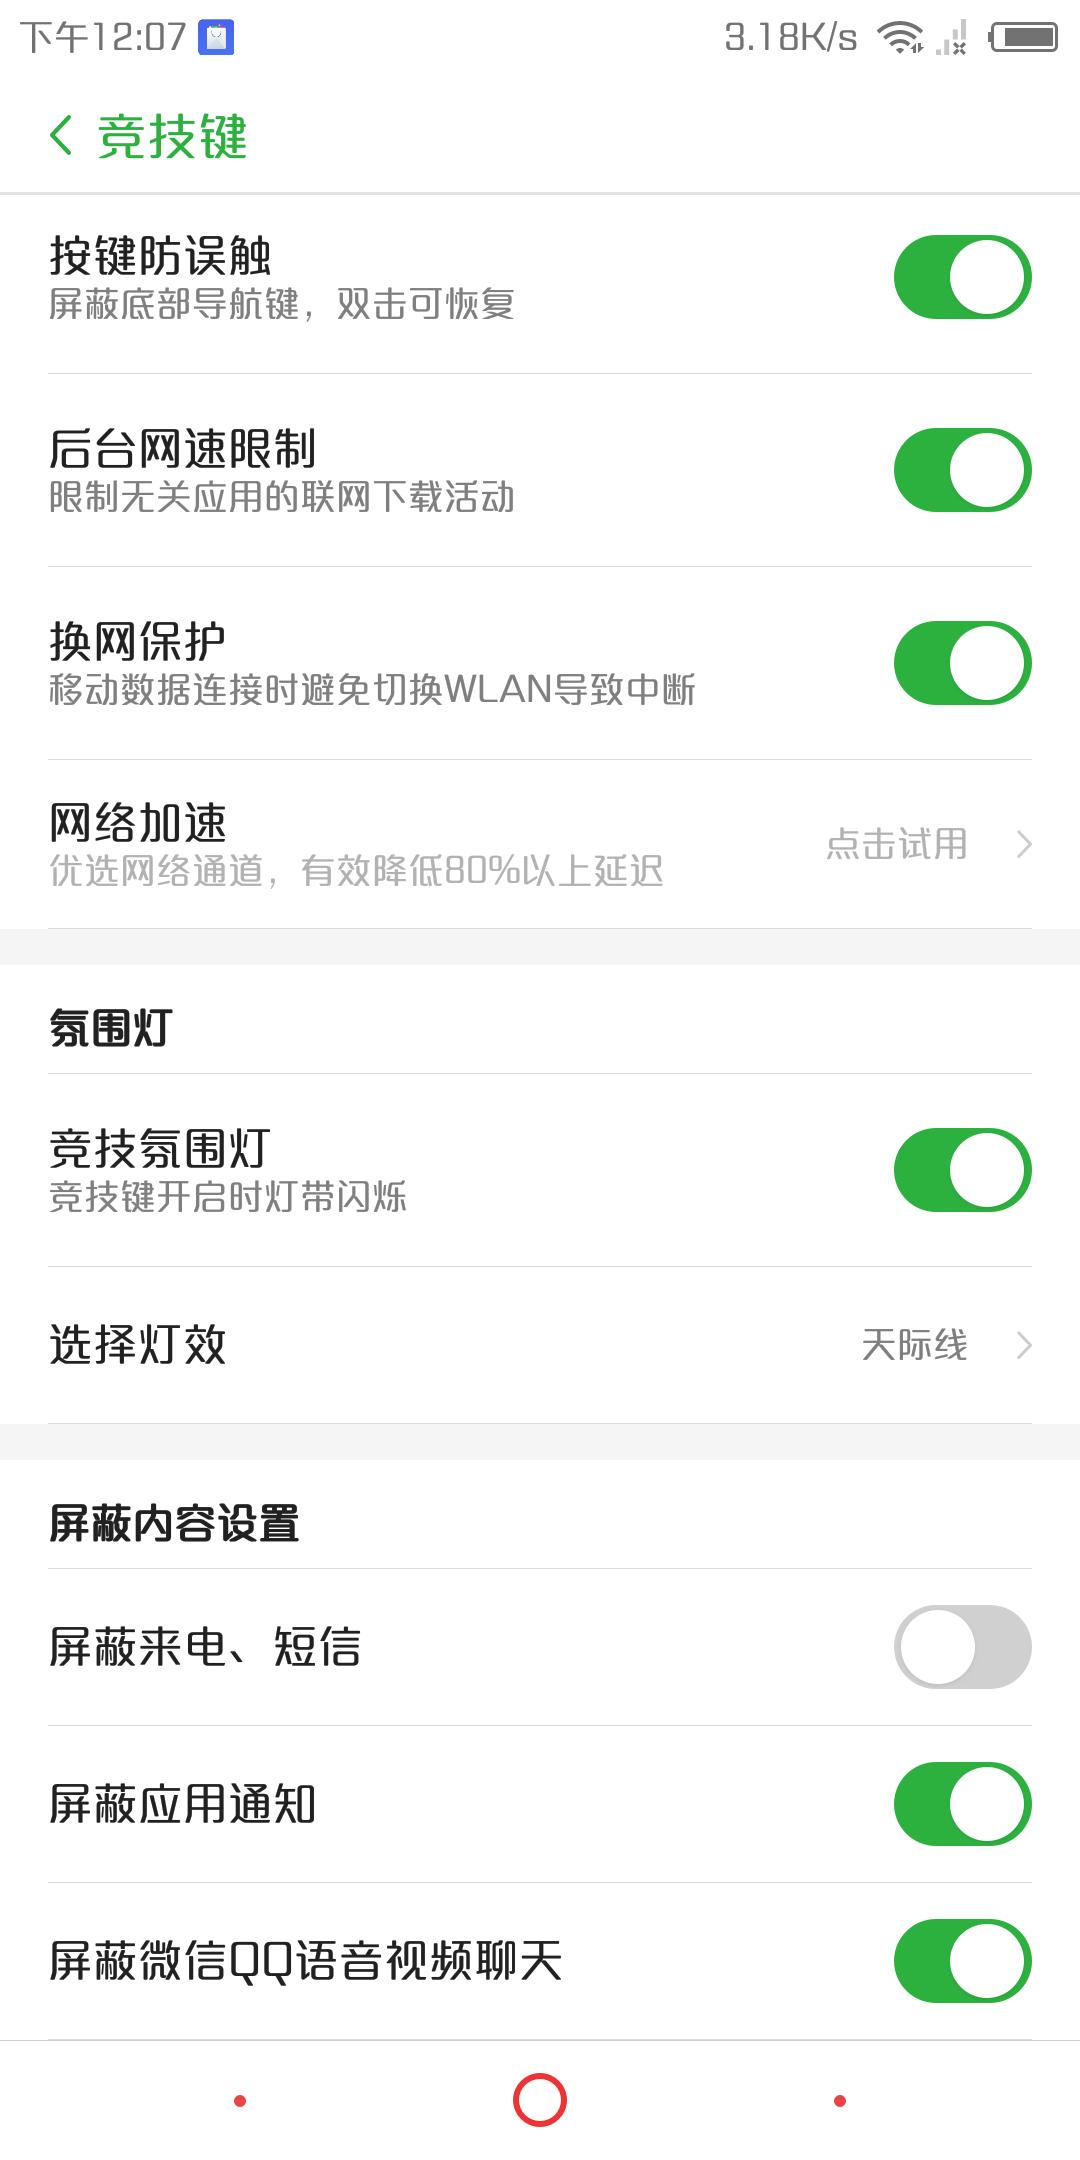 Screenshot_2018-04-27-12-07-04.png